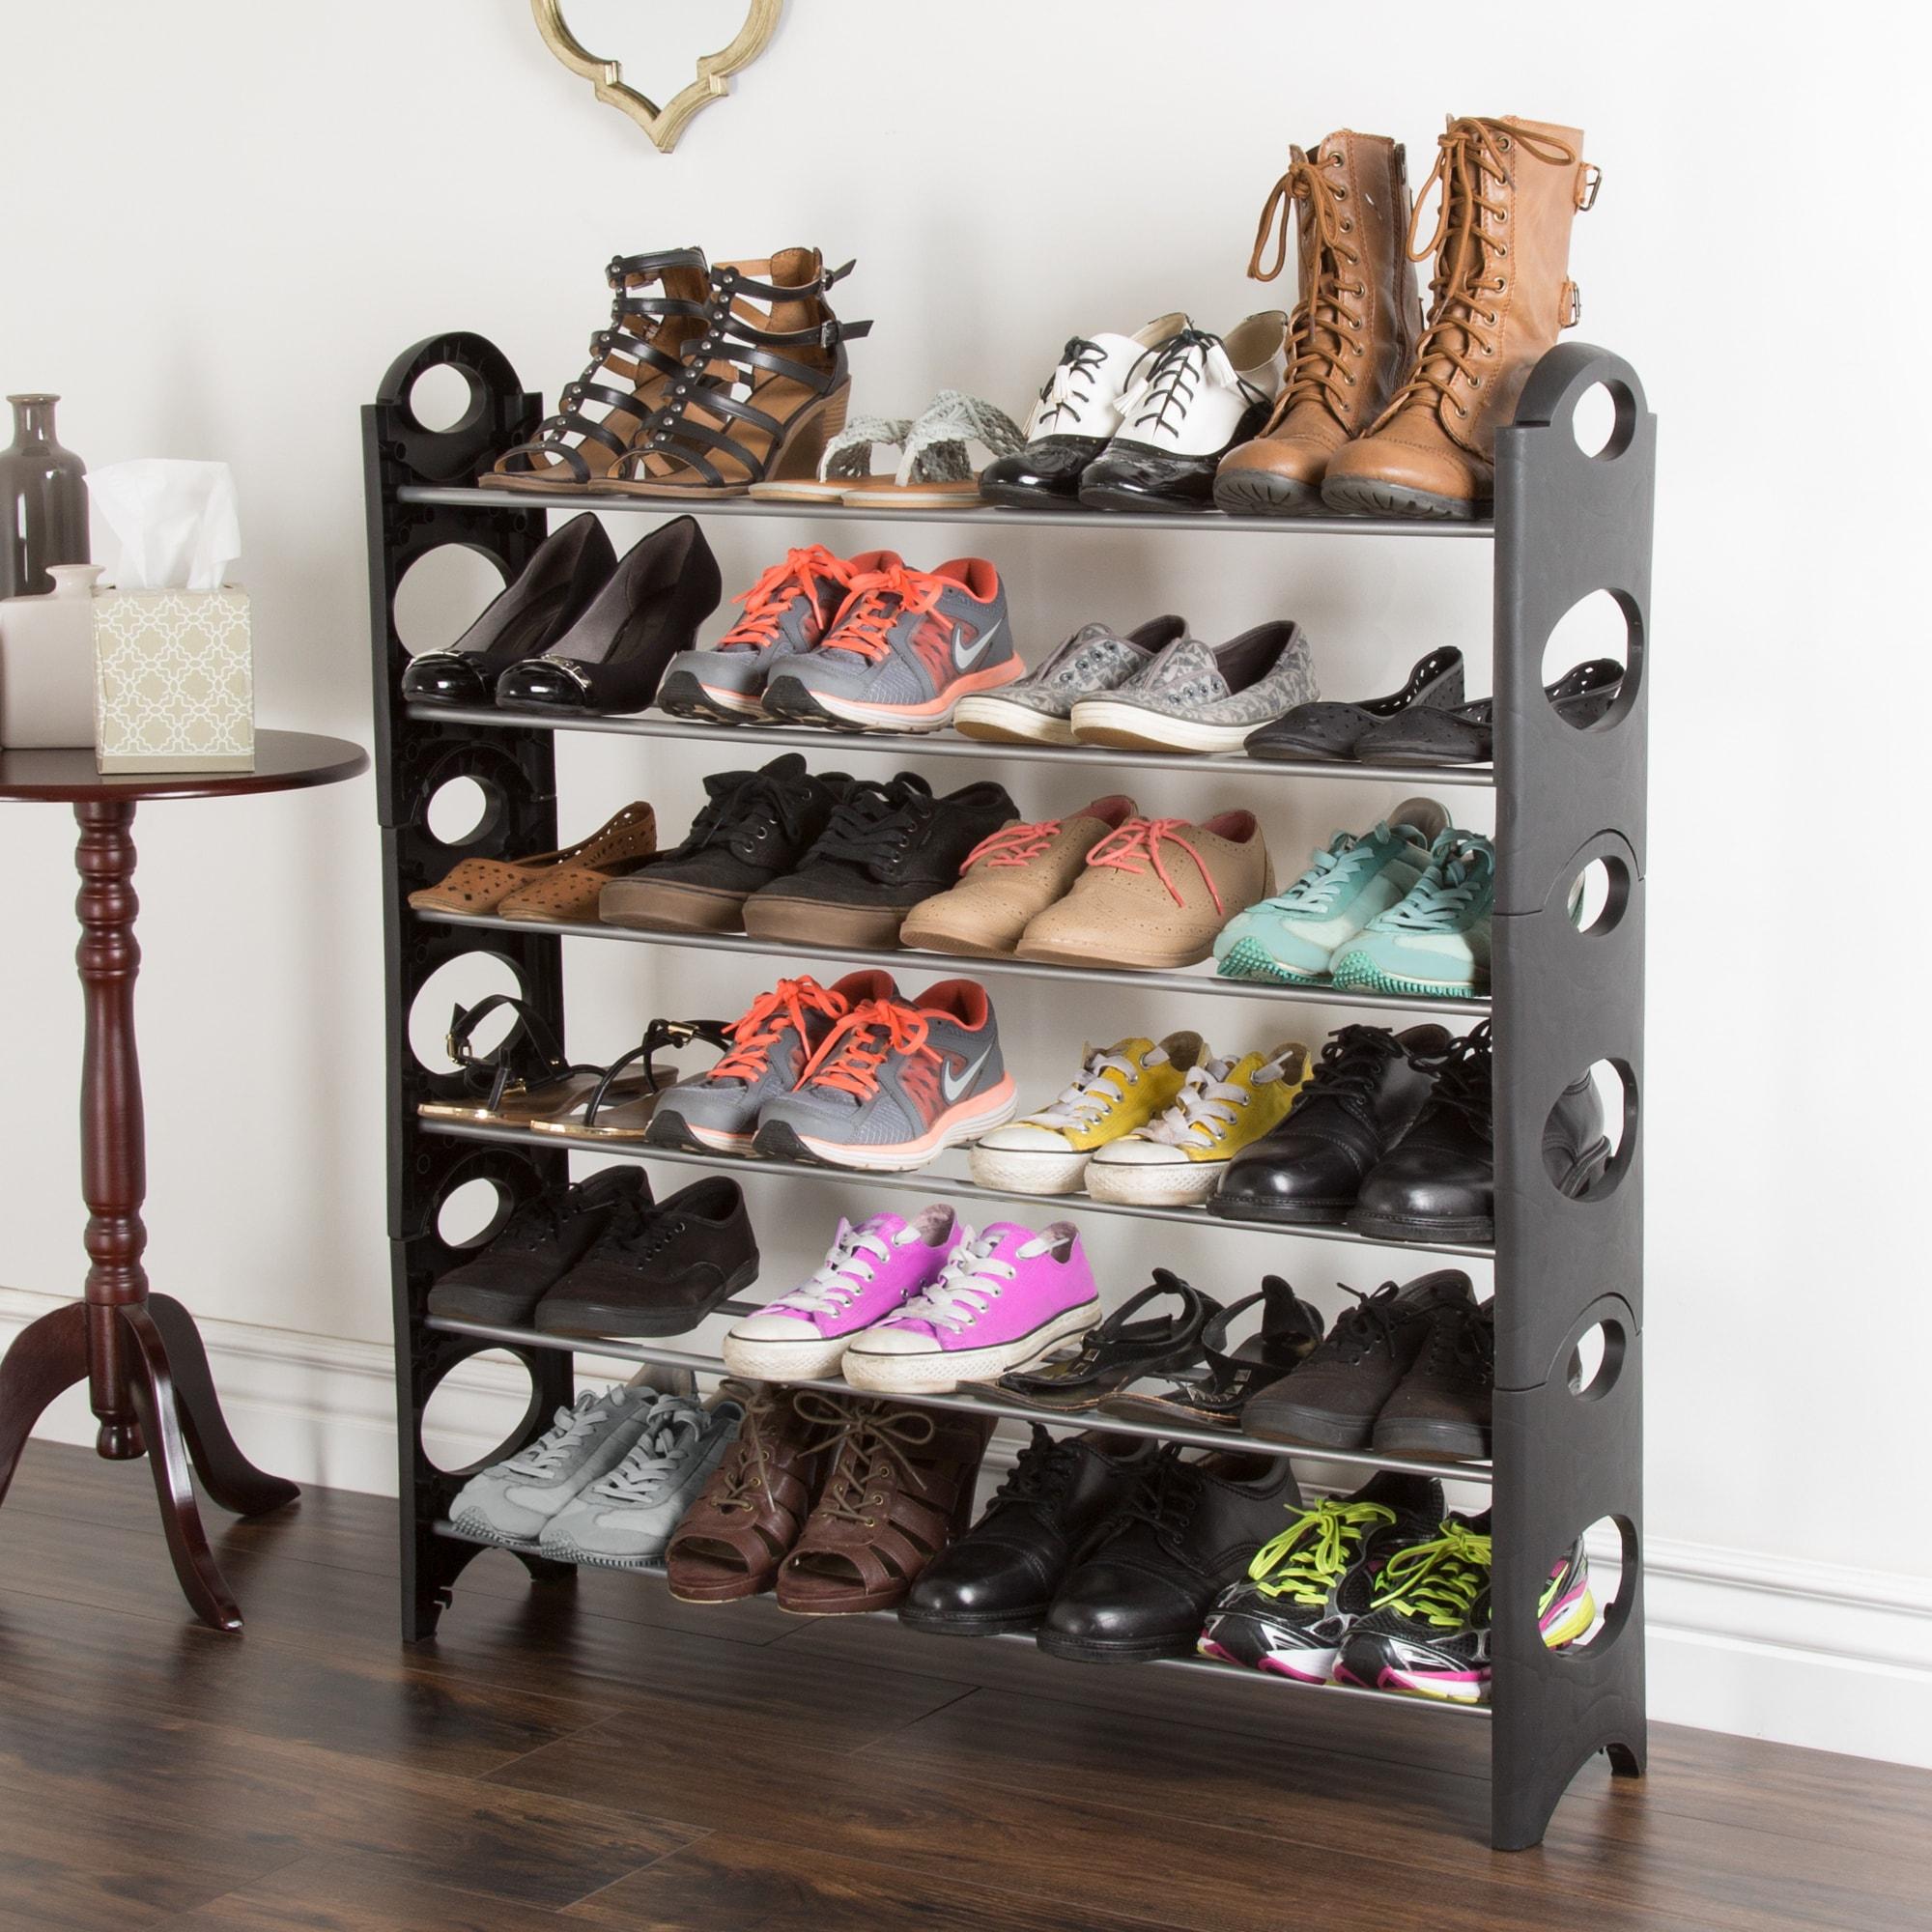 Everyday Home 6 Tier Stackable Shoe Rack 24 Pair Capacity - Black